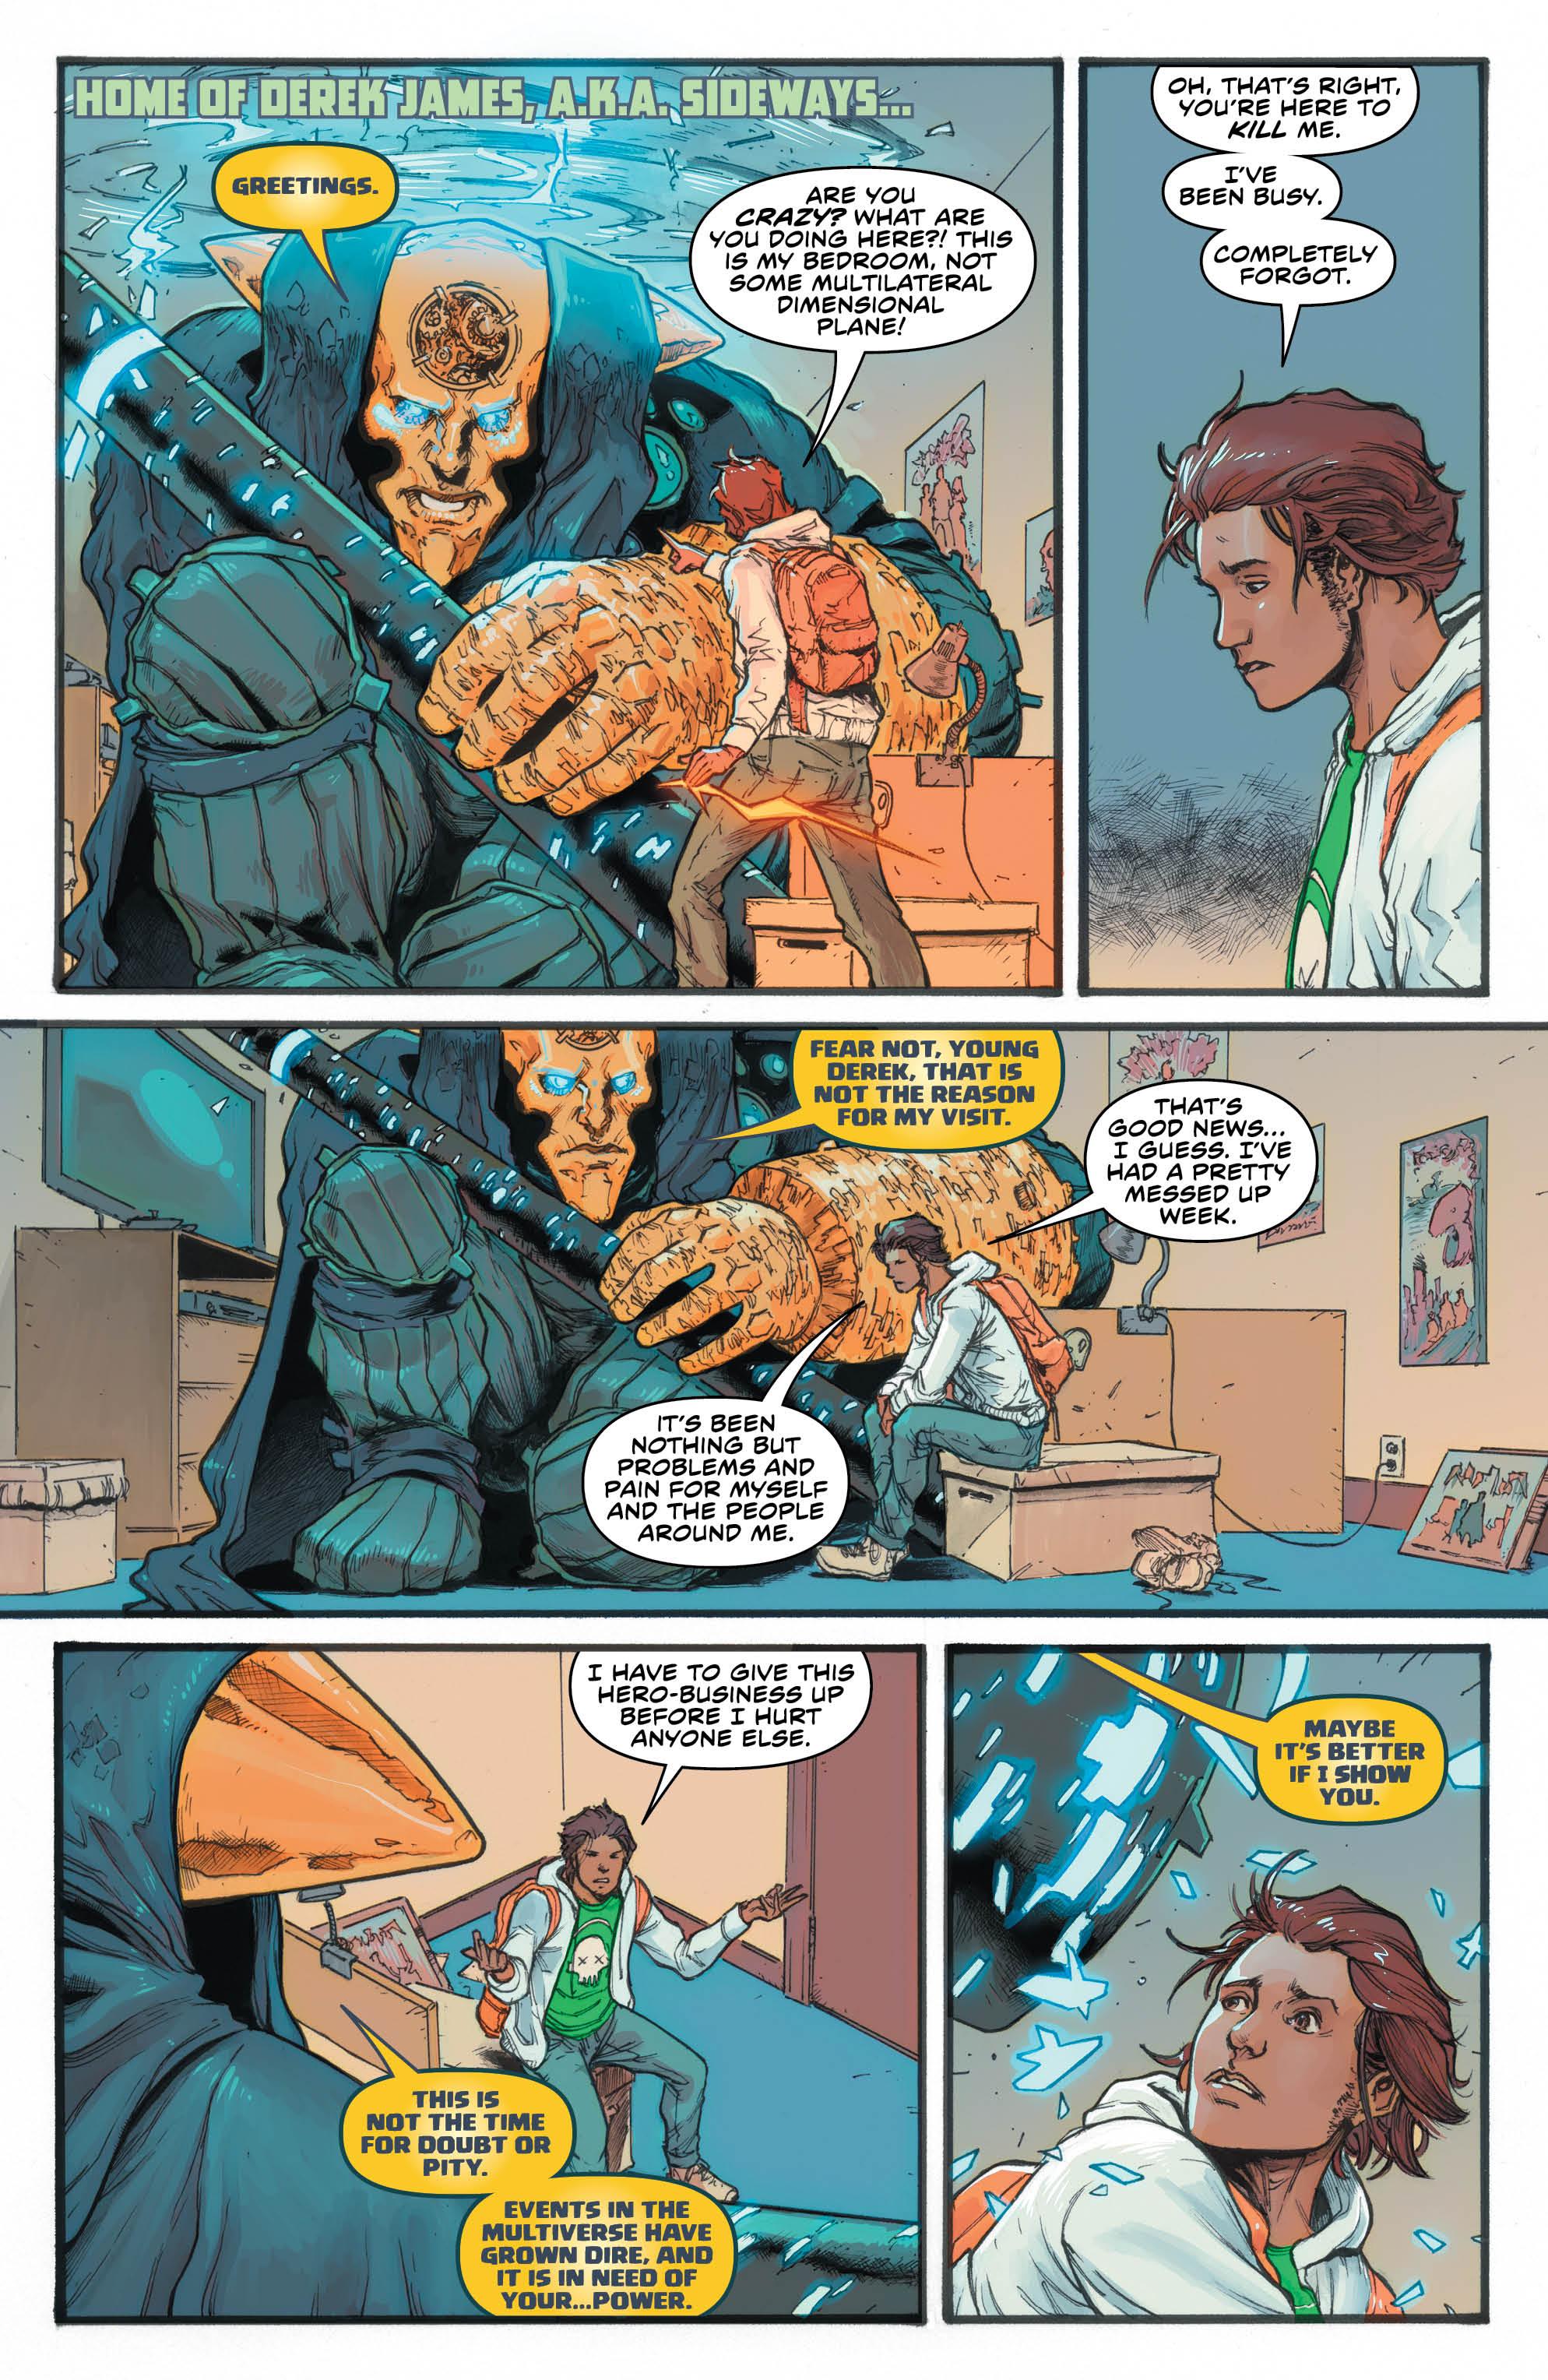 Sideways #5 page 1